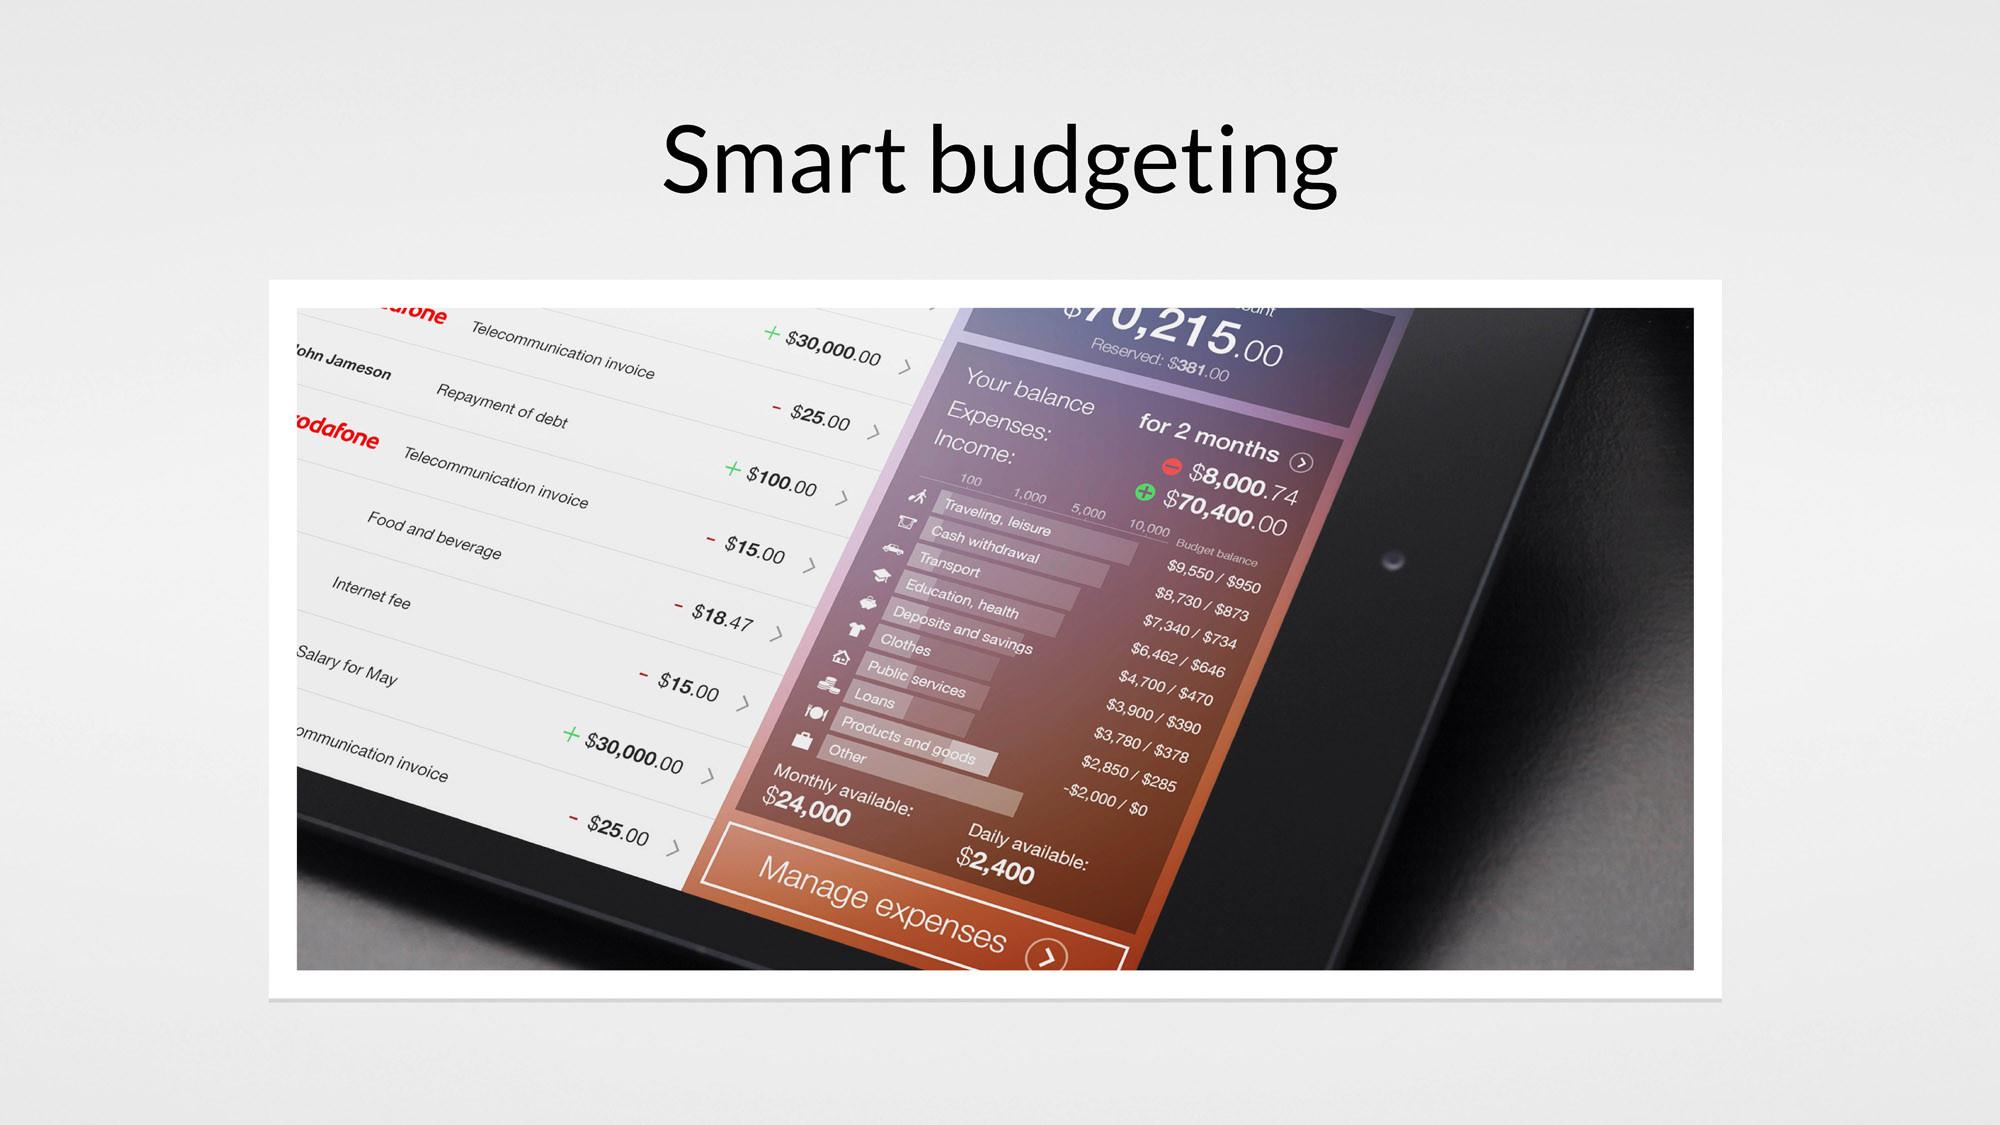 uxda-smart-budgeting-banking-solution